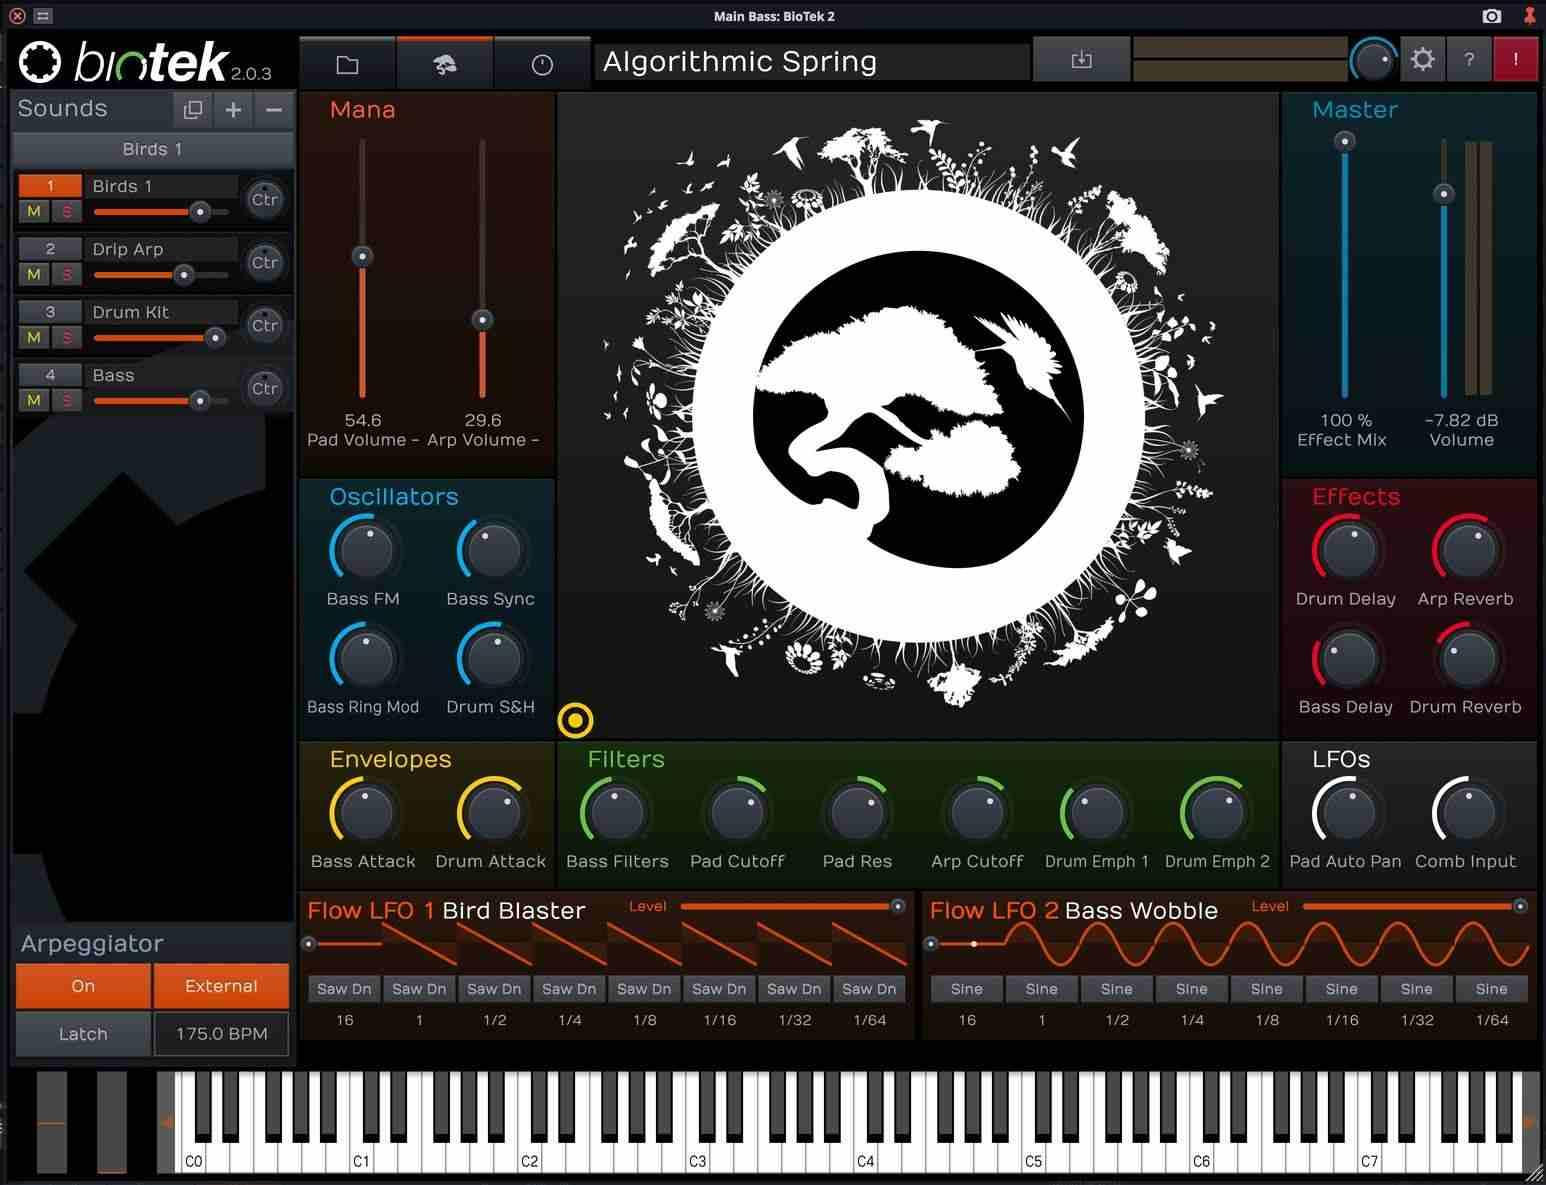 Tracktion BioTek  2 - Main GUI